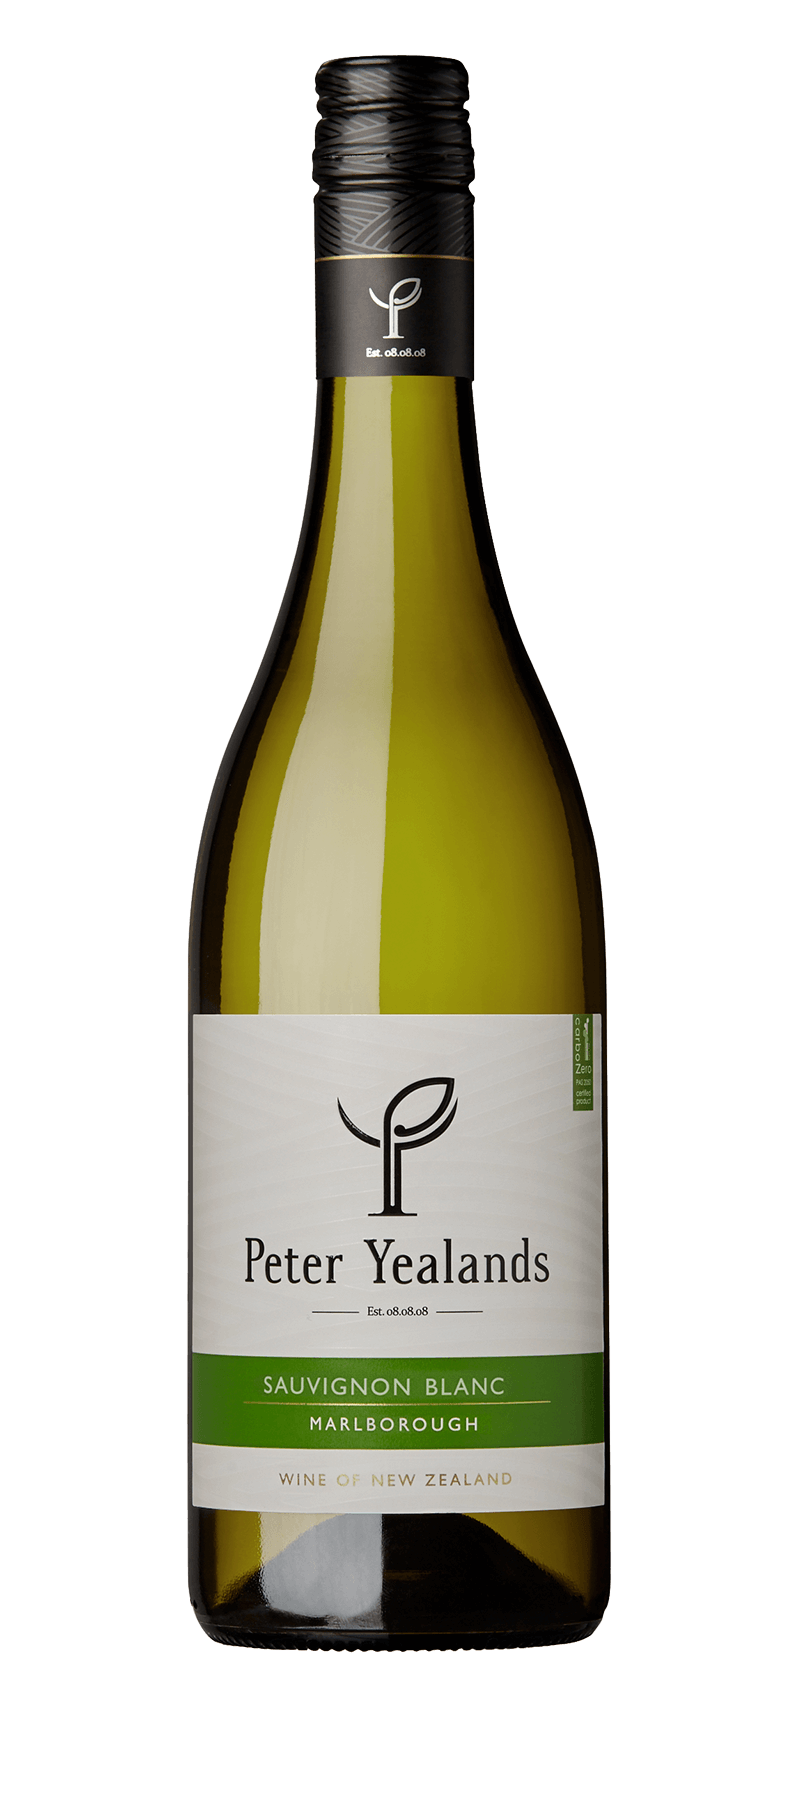 Enjoy International #SauvignonBlancDay with Peter Yealands Sauvignon Blanc 2017